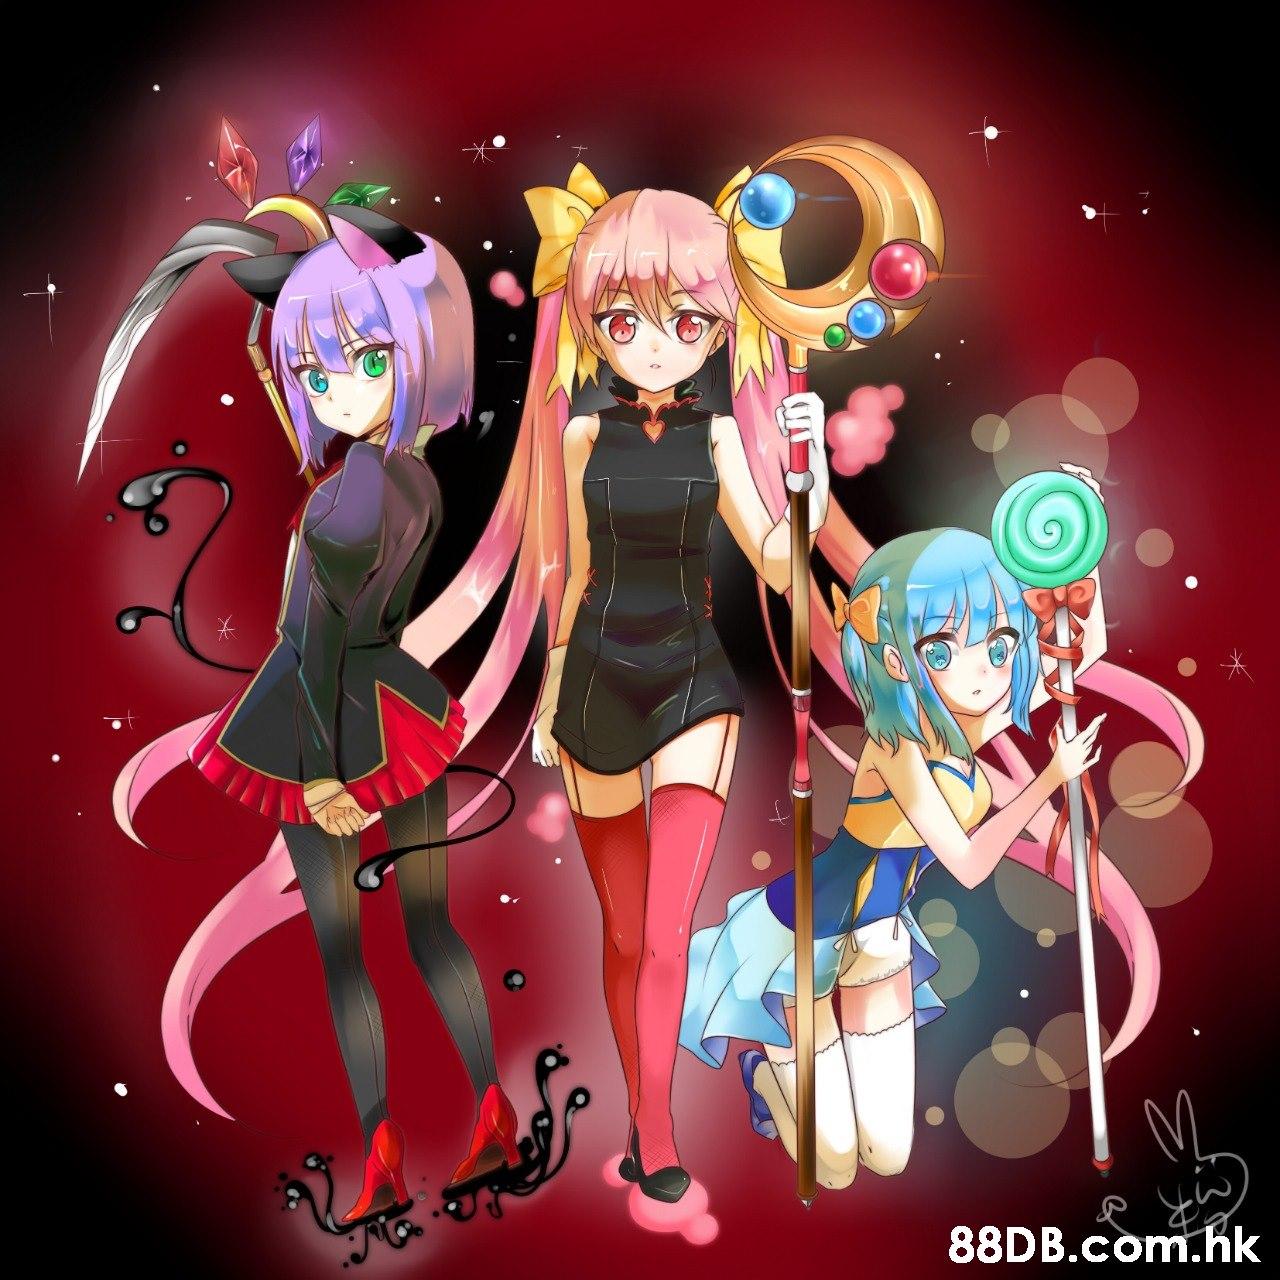 .hk  Anime,Cartoon,Illustration,Fictional character,Cg artwork